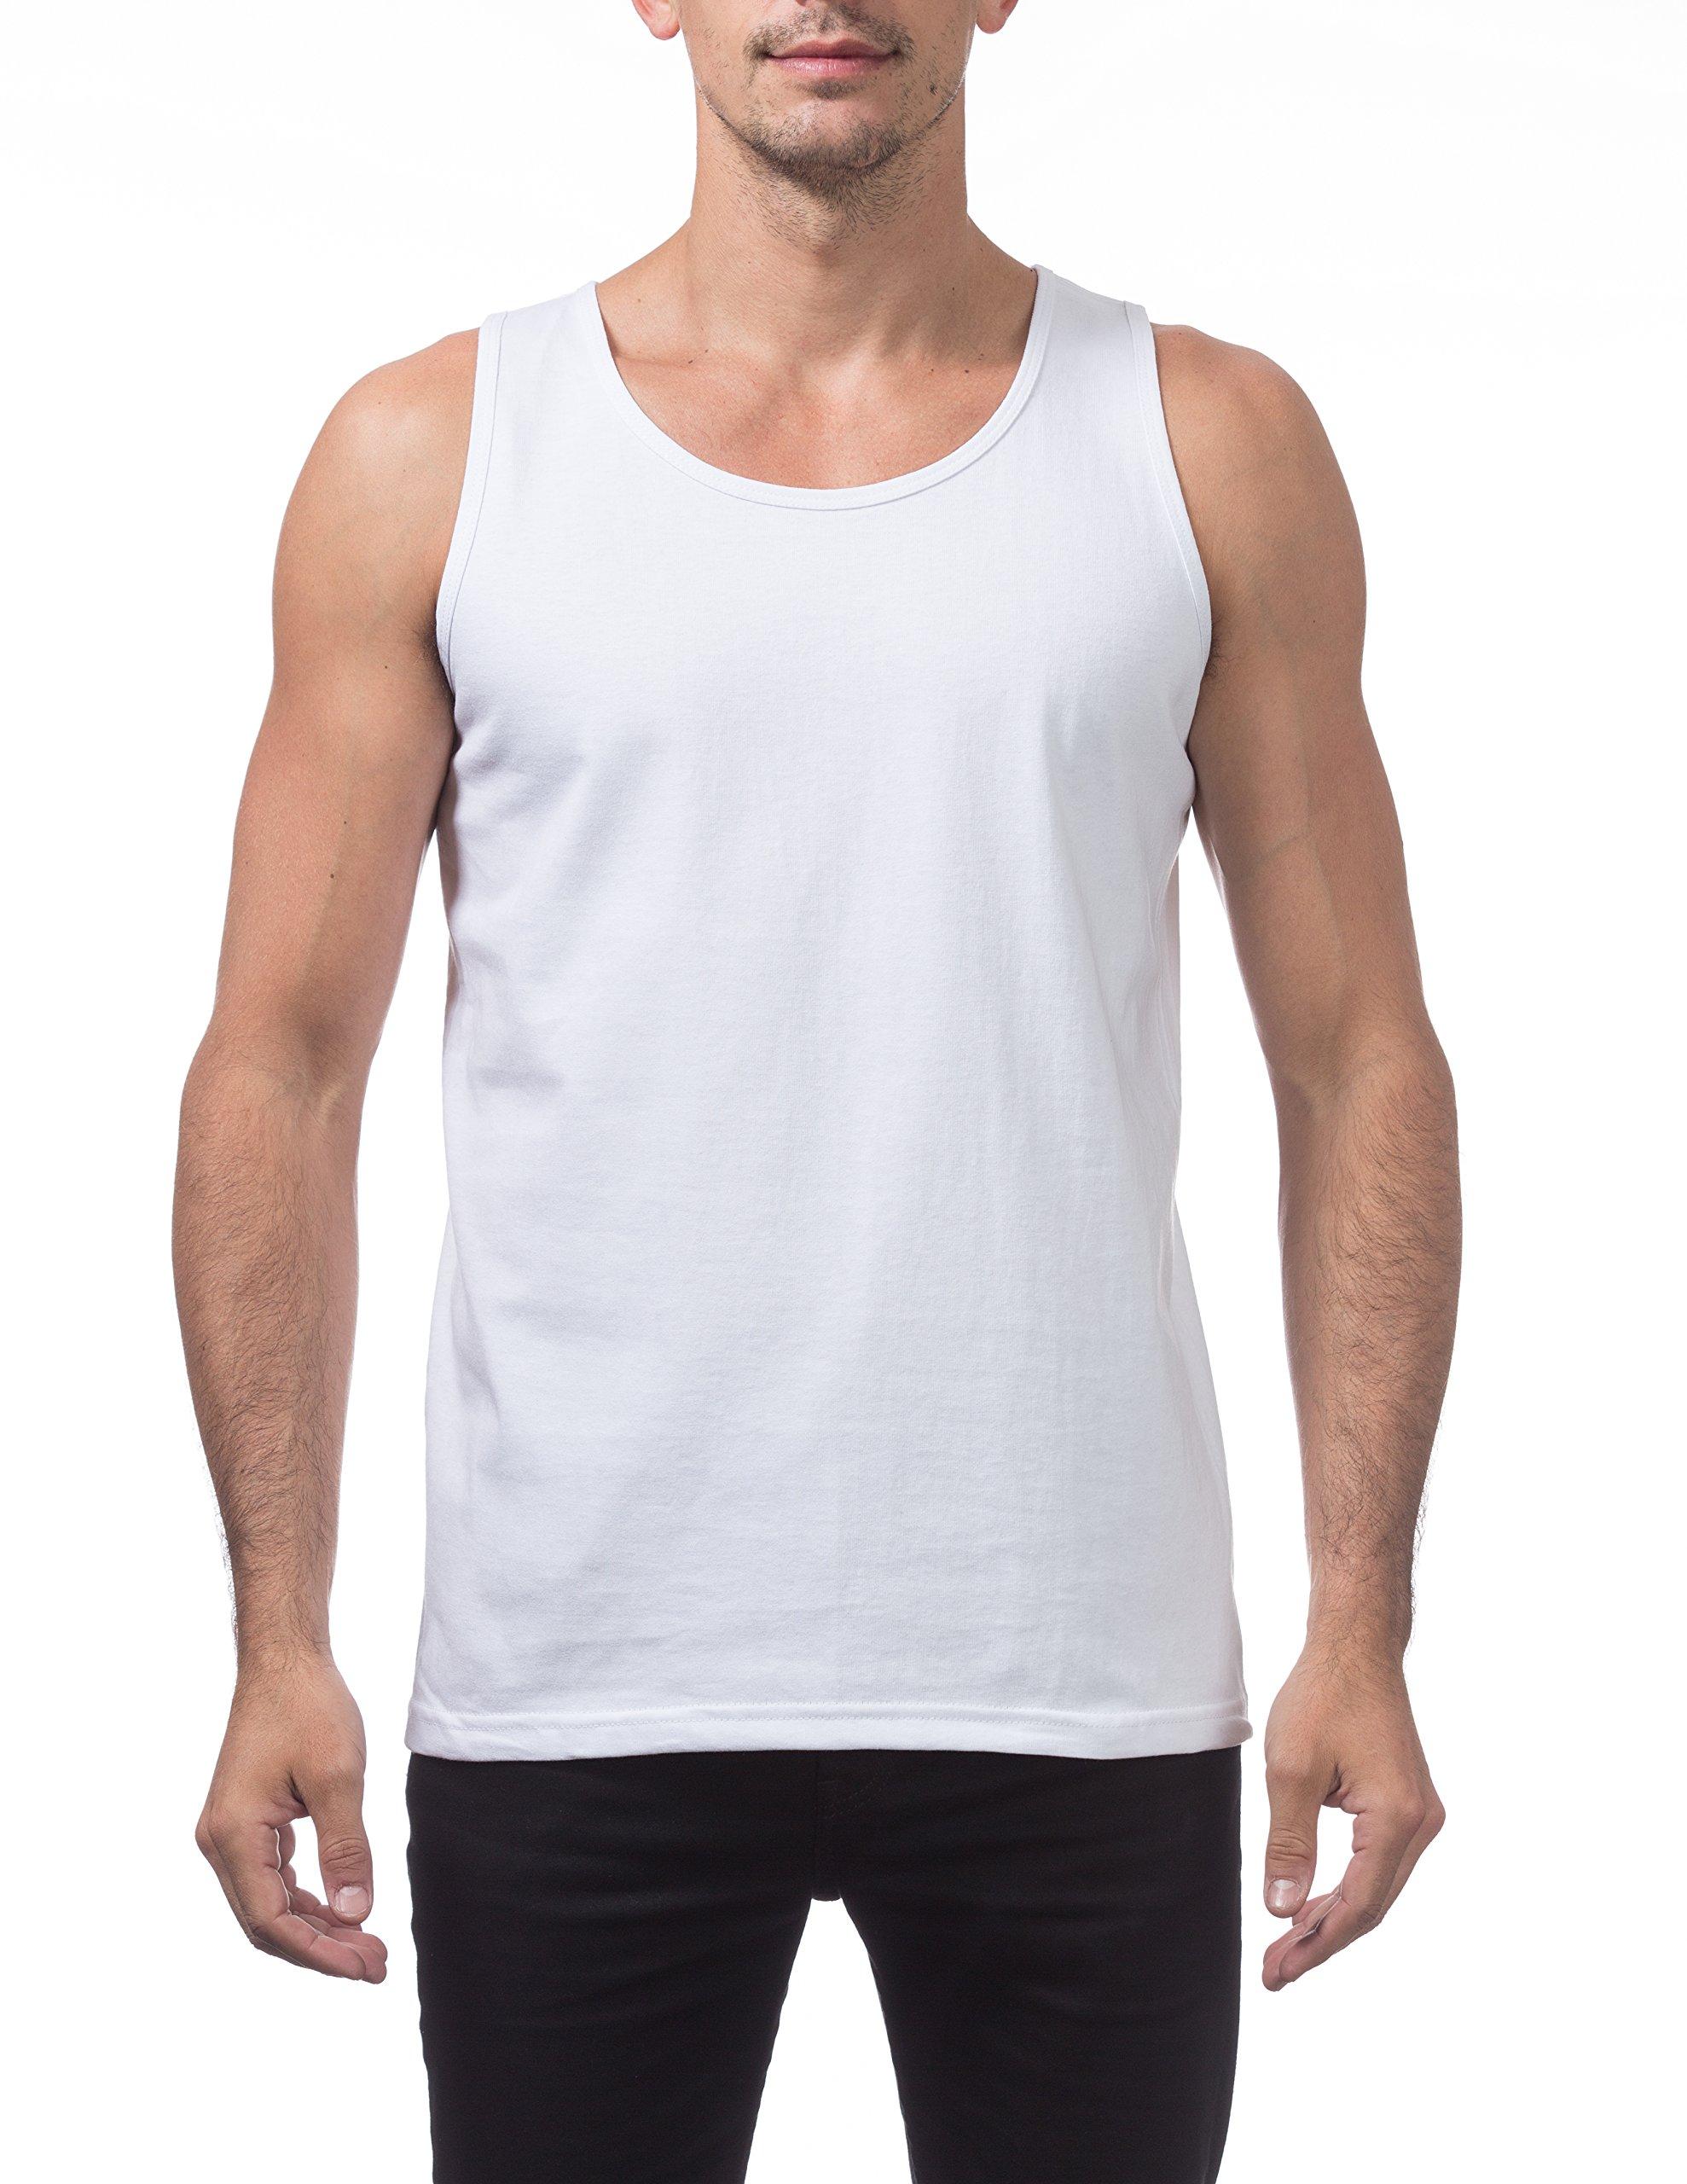 Pro Club Men's Heavyweight Cotton Tank Top Outerwear, 2X-Large, Snow White